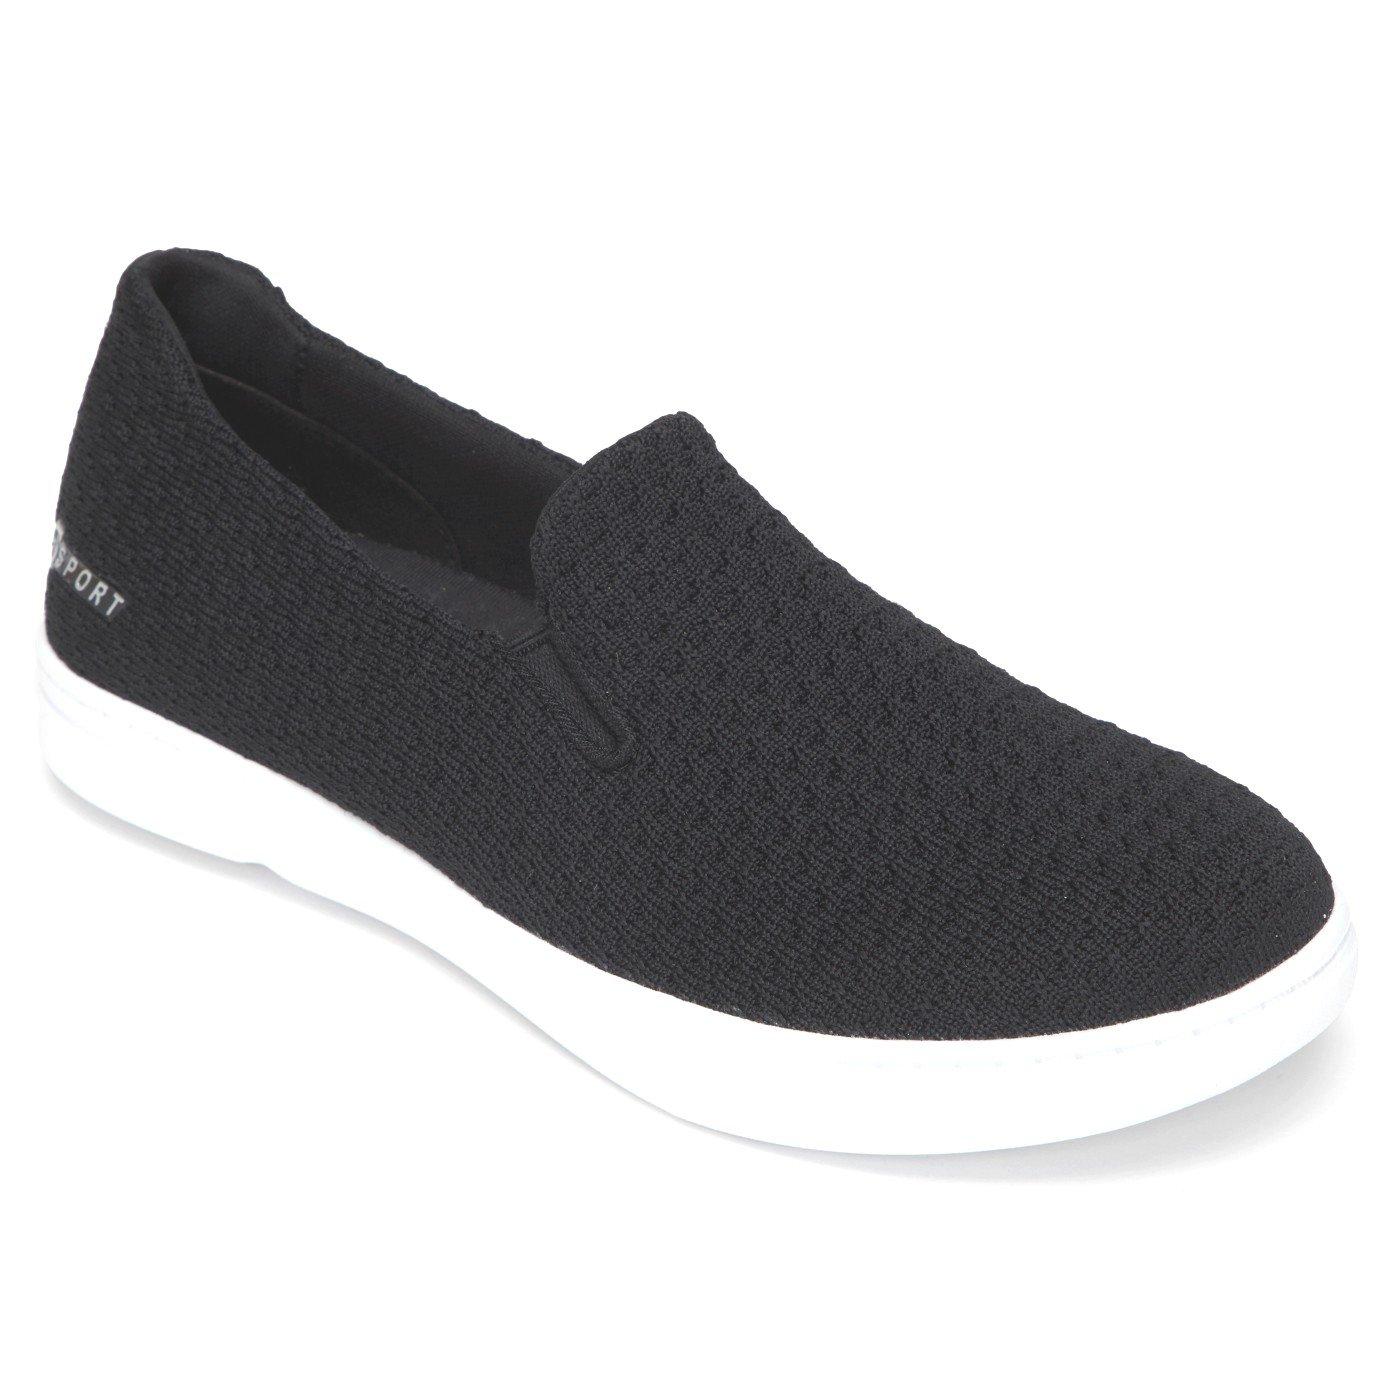 skechers on the go harbor, Skechers Casual, Sport & Dress Shoes